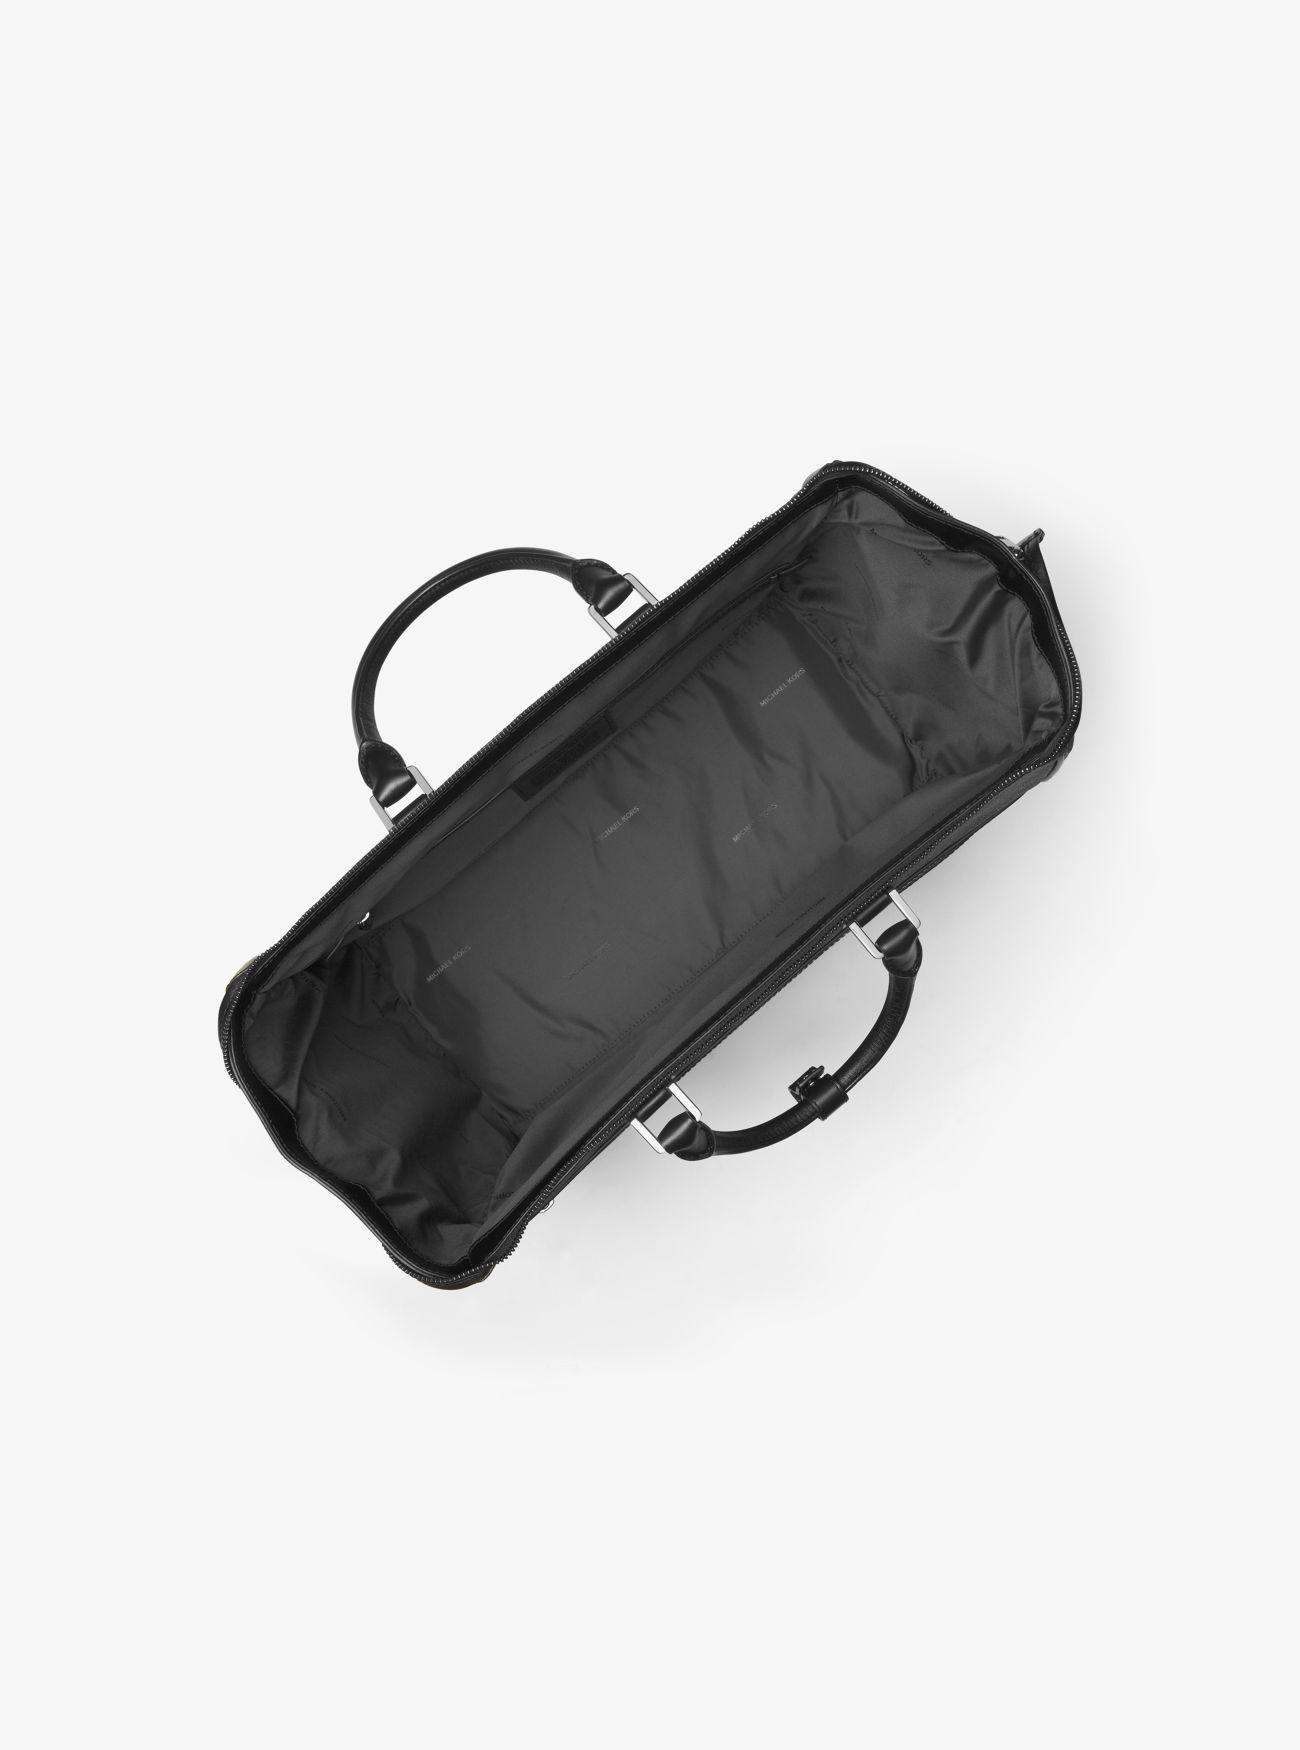 461def0344 Lyst - Michael Kors Jet Set Travel Carry-on Duffel in Black for Men